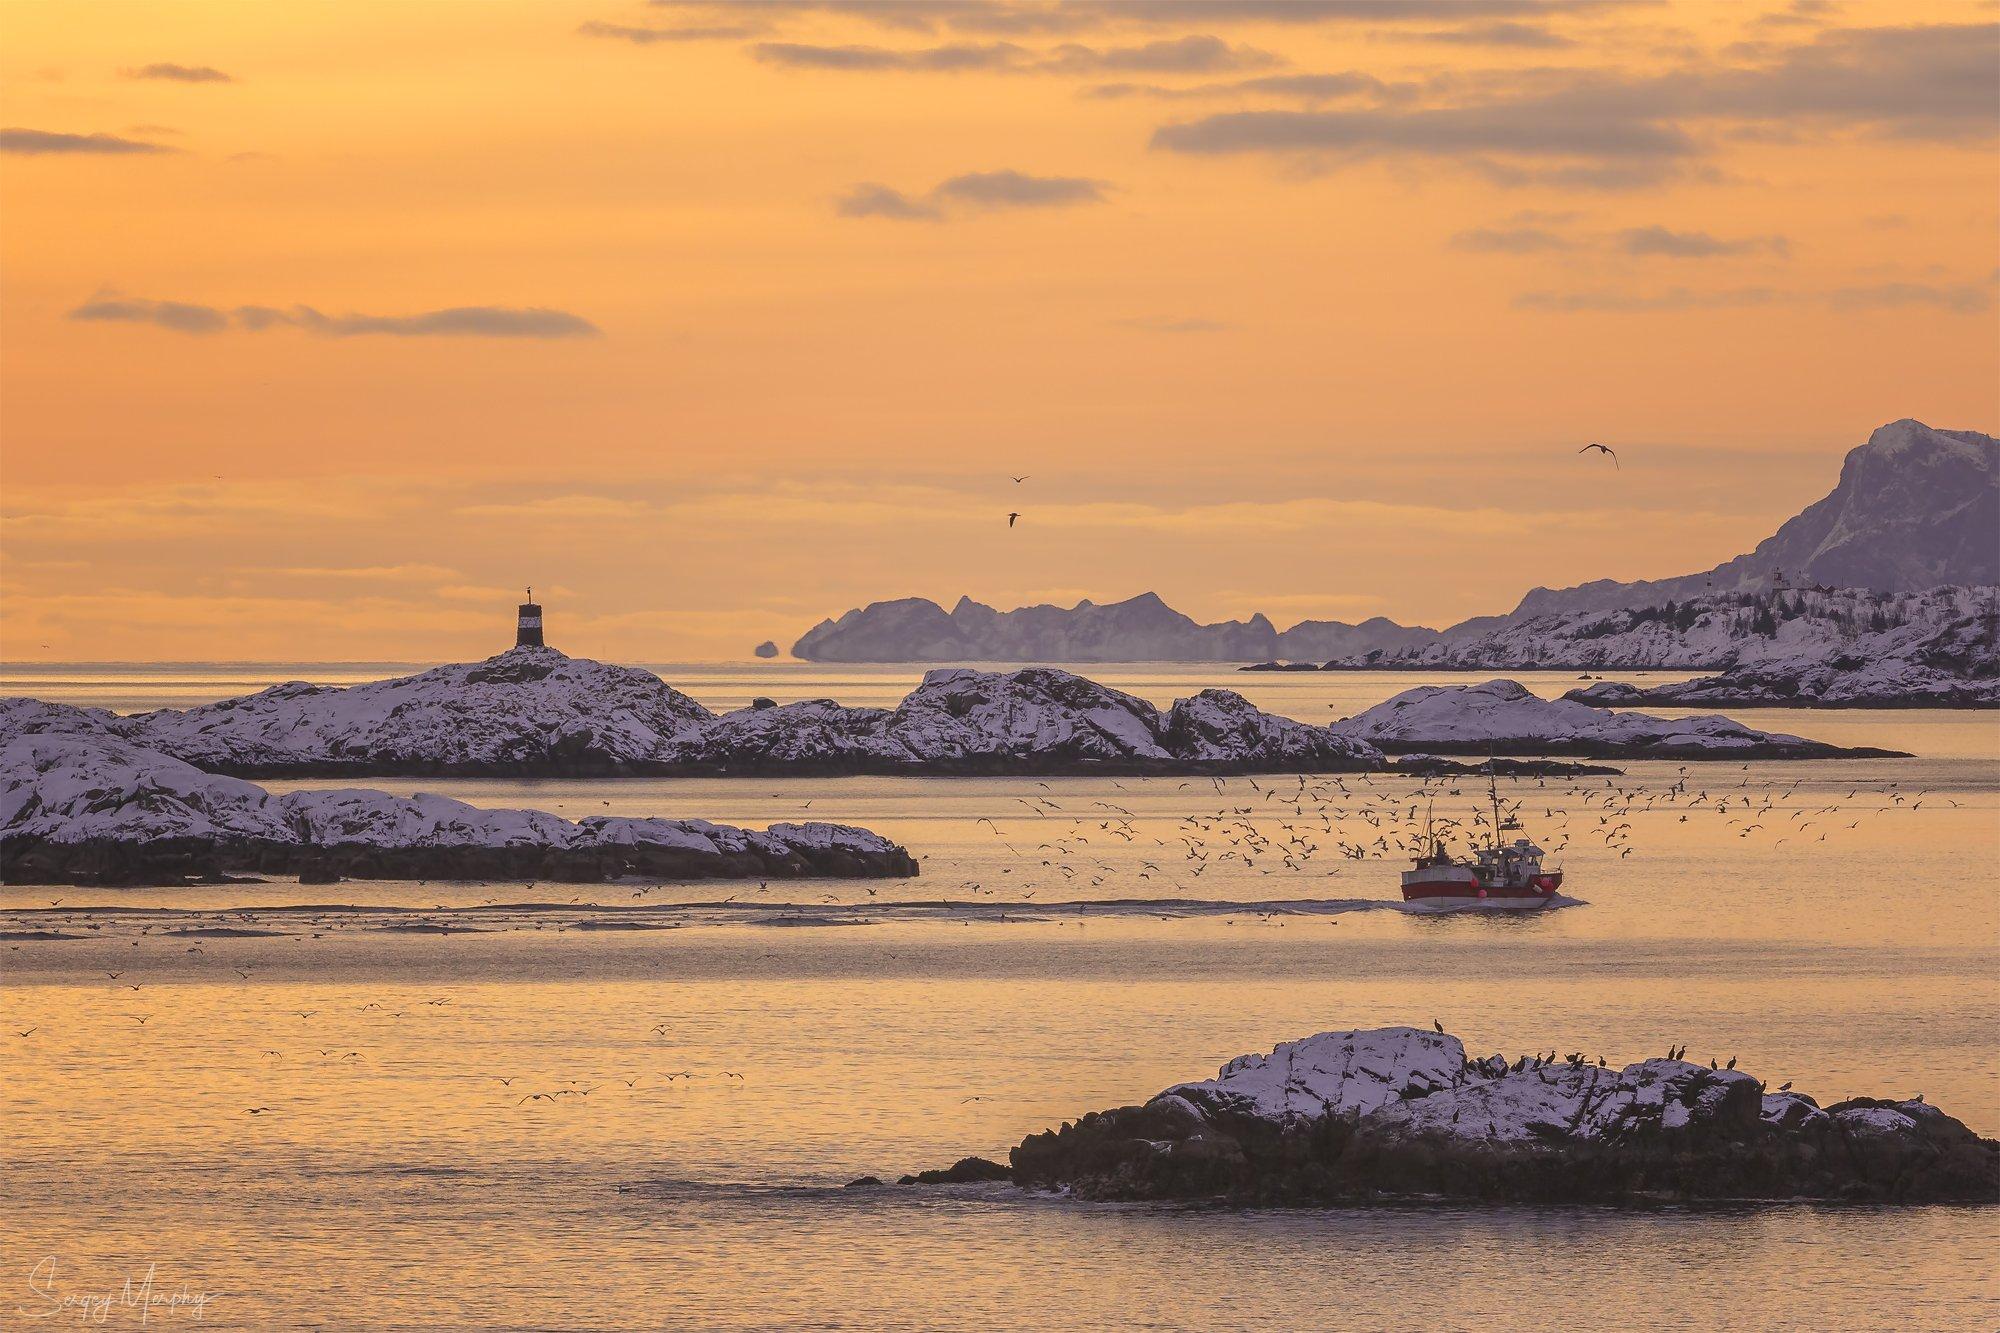 fishermans\' boat lofotens norway, Merphy Sergey